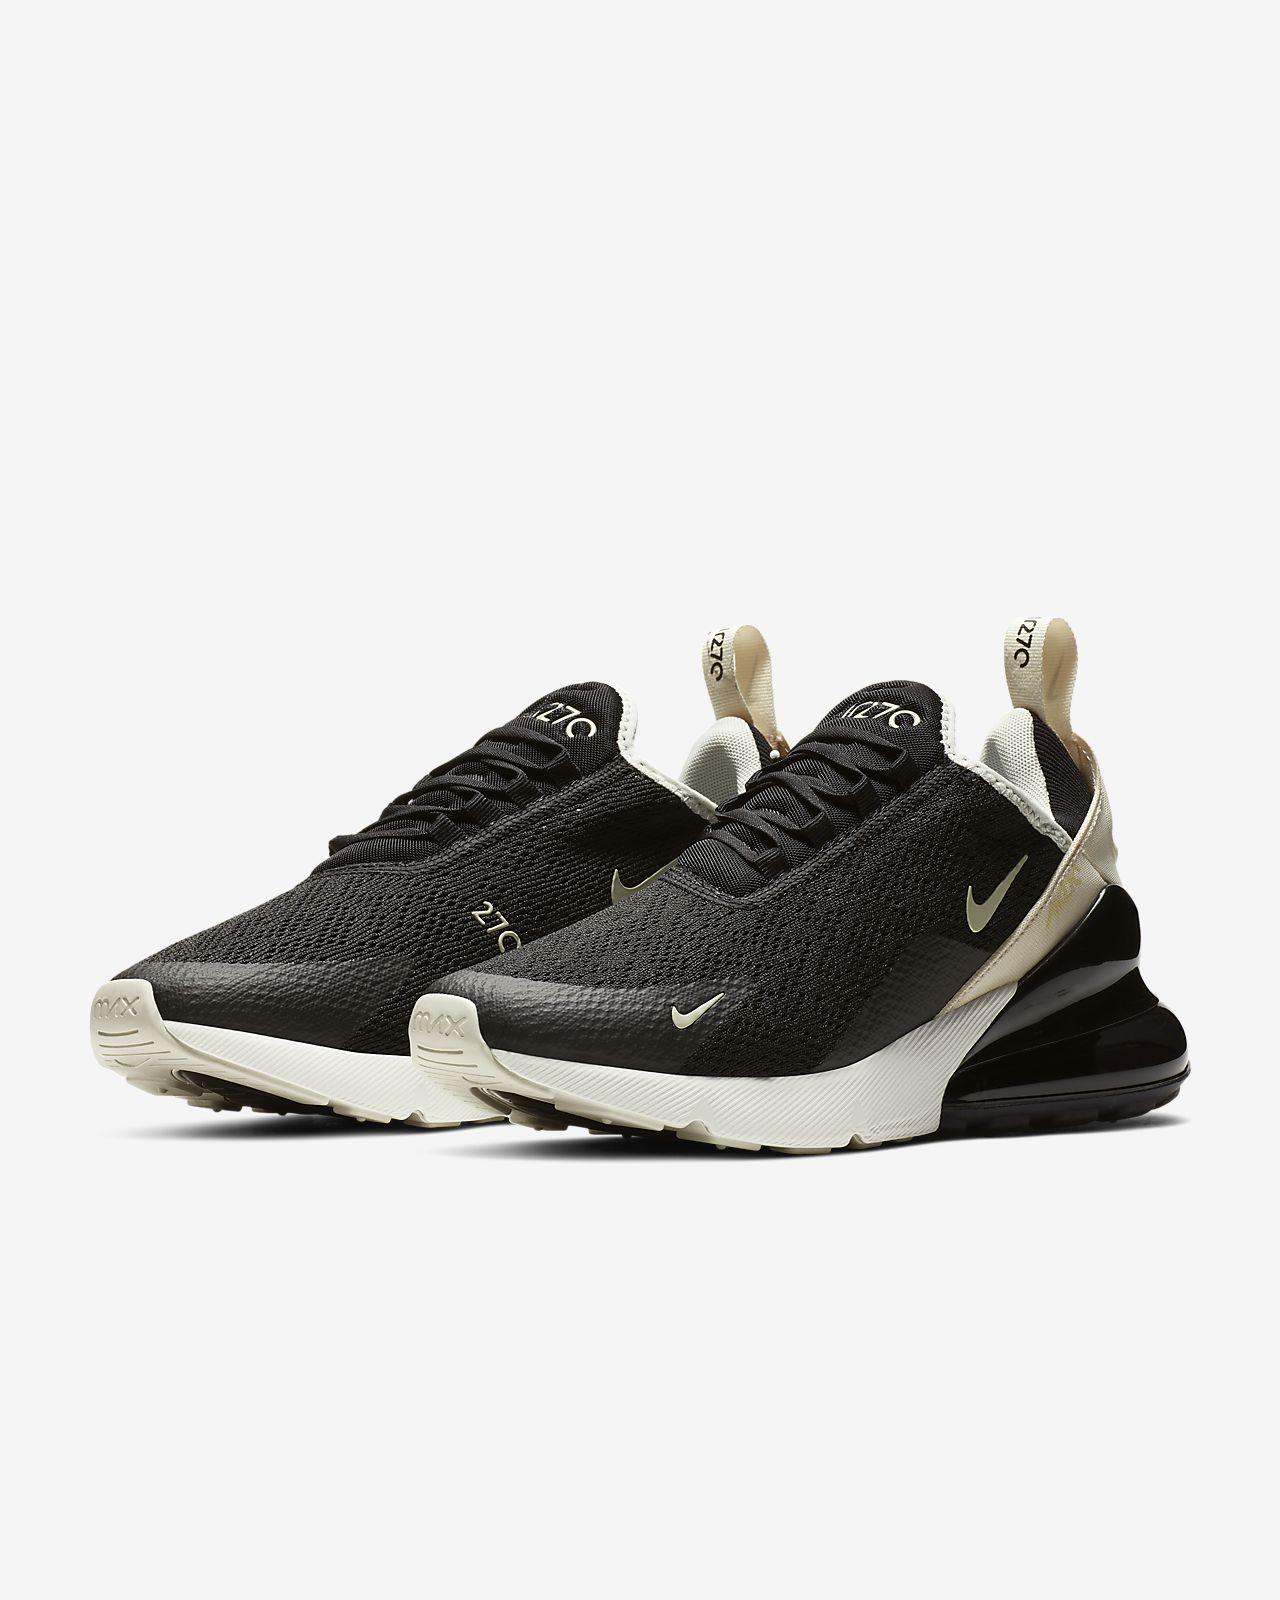 f83c139e41b9 Nike Air Max 270 Women s Shoe. Nike.com NL